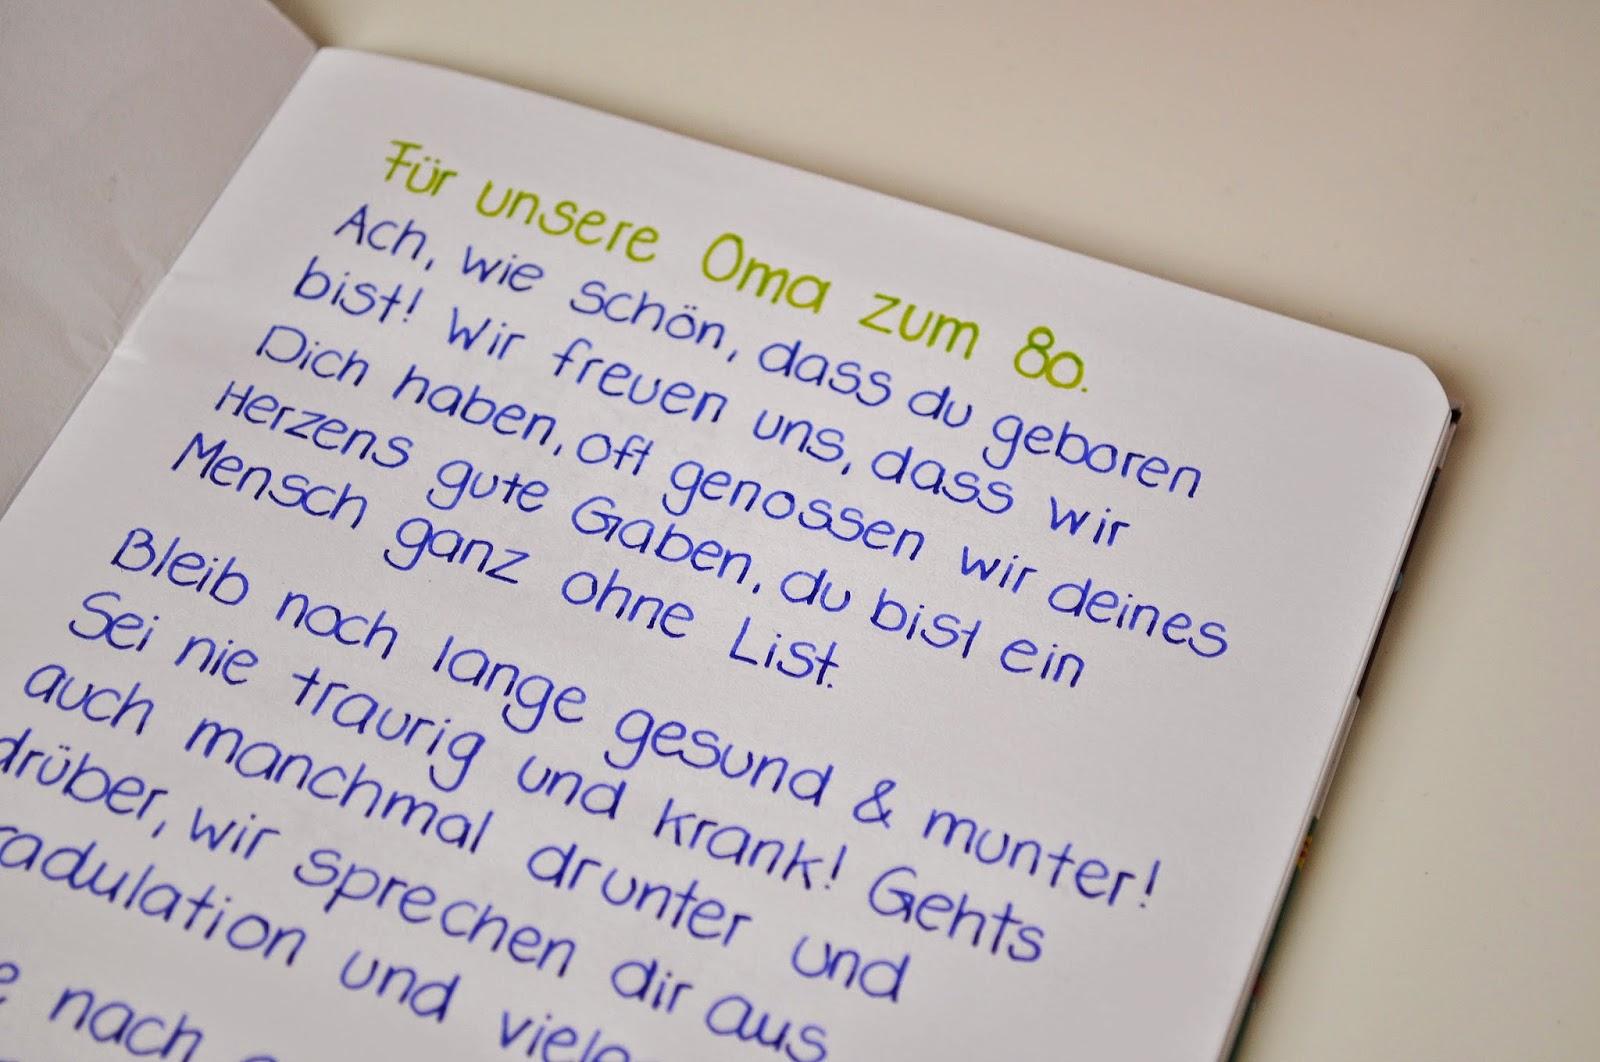 Gedicht Zum 70 Geburtstag Oma Kurz Hylen Maddawards Com